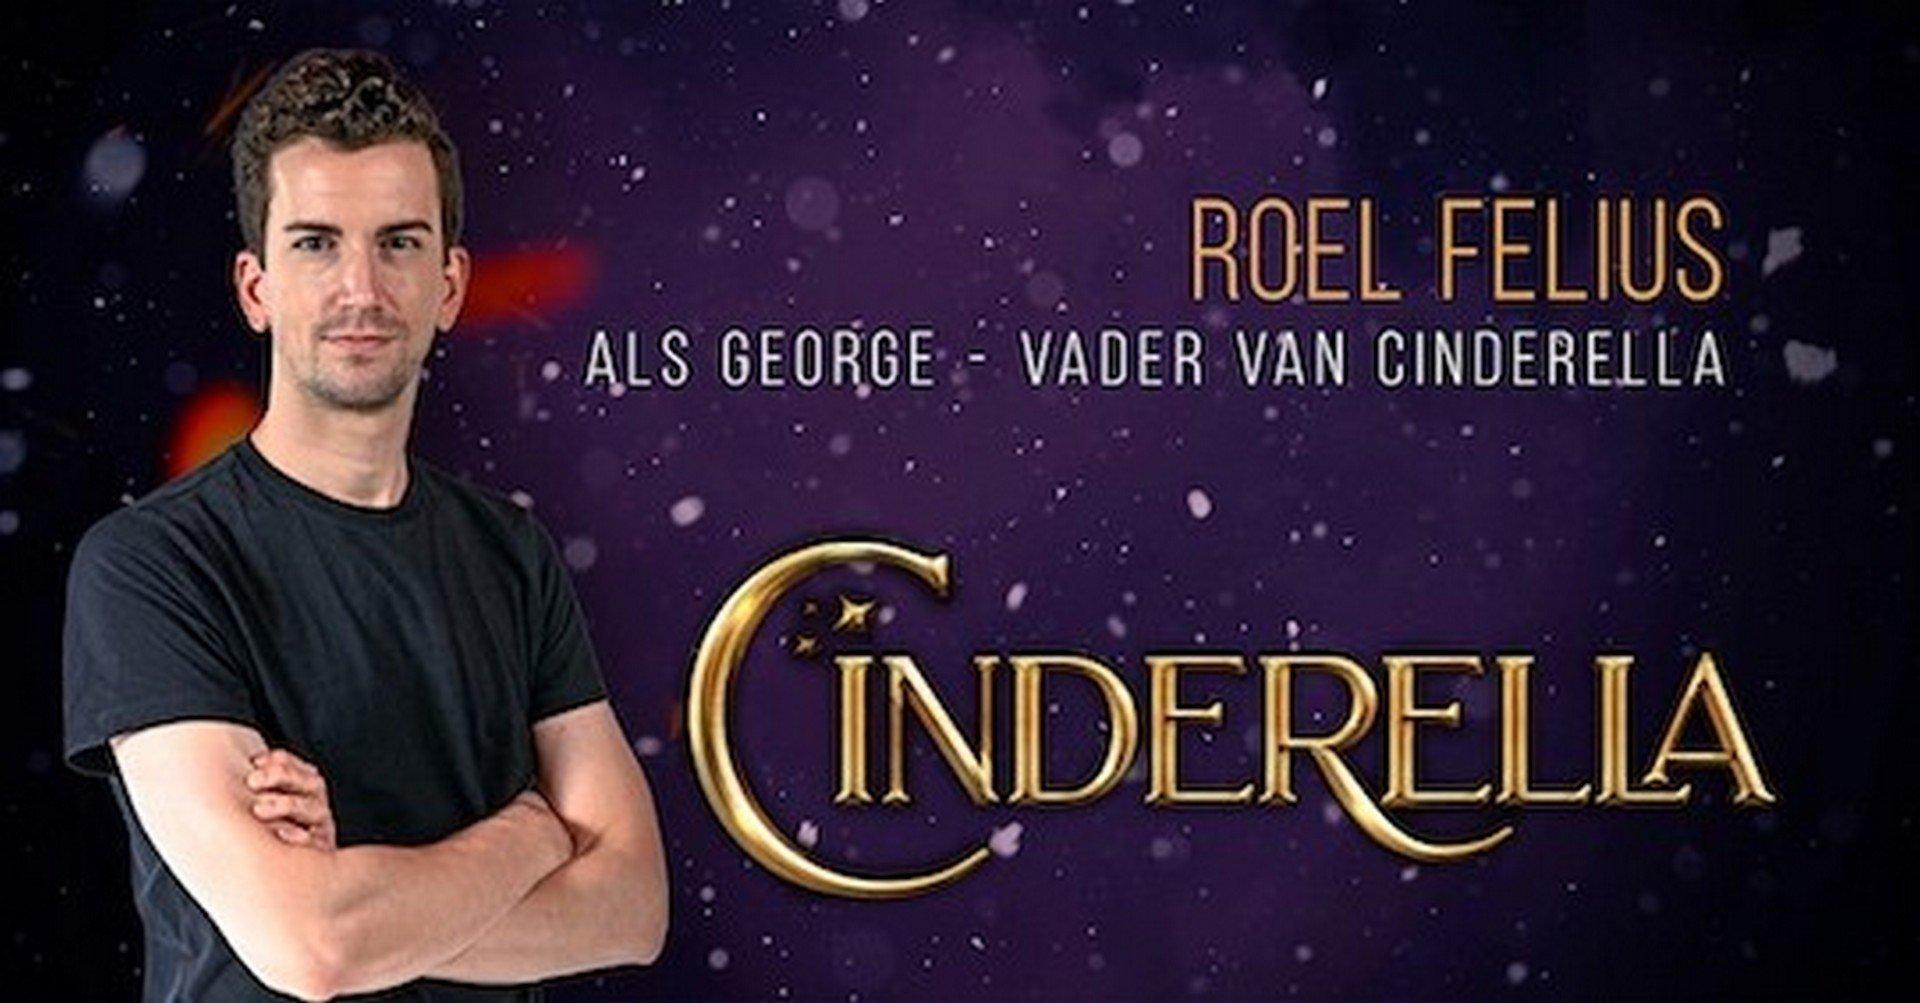 Pieter Casteleyn (Prins) en Roel Felius (vader Cinderella) vervolledigen hoofdcast 'Cinderella' - Cinderella 3